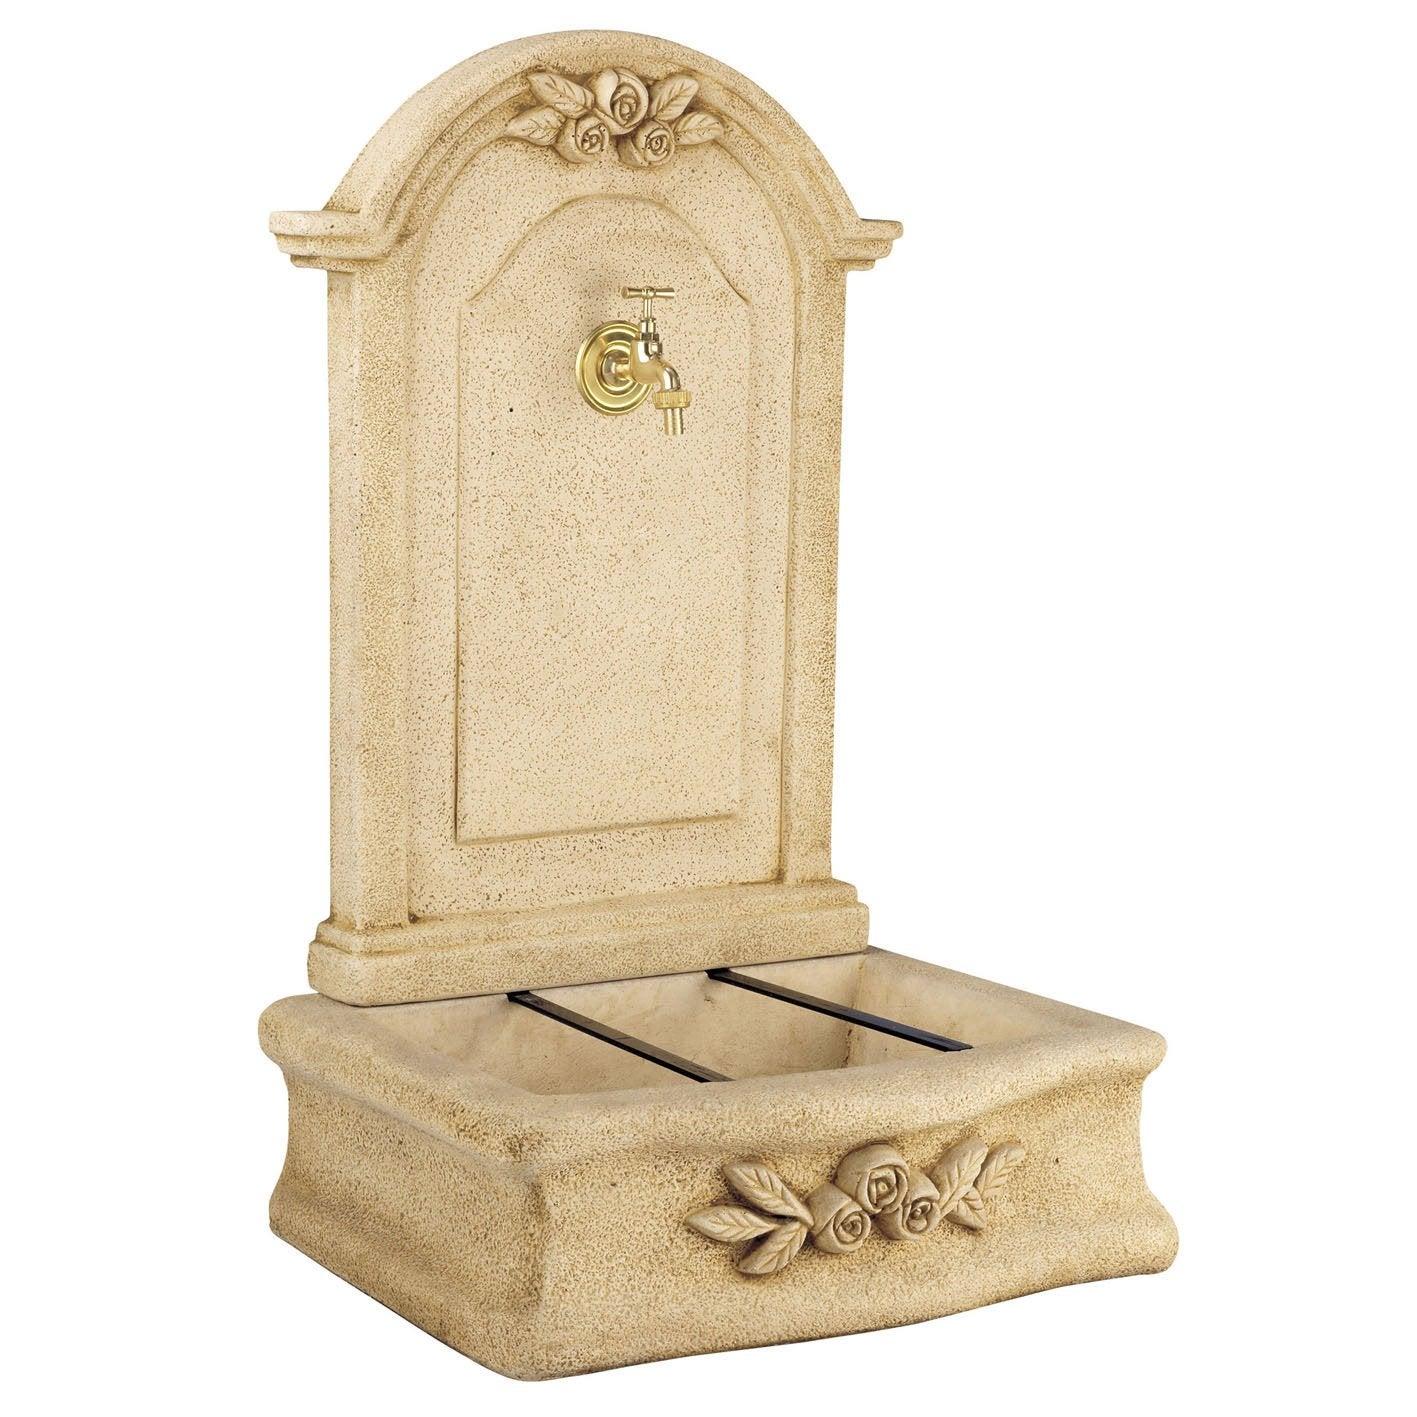 fontaine de jardin en pierre reconstitu e ton pierre beausoleil leroy merlin. Black Bedroom Furniture Sets. Home Design Ideas